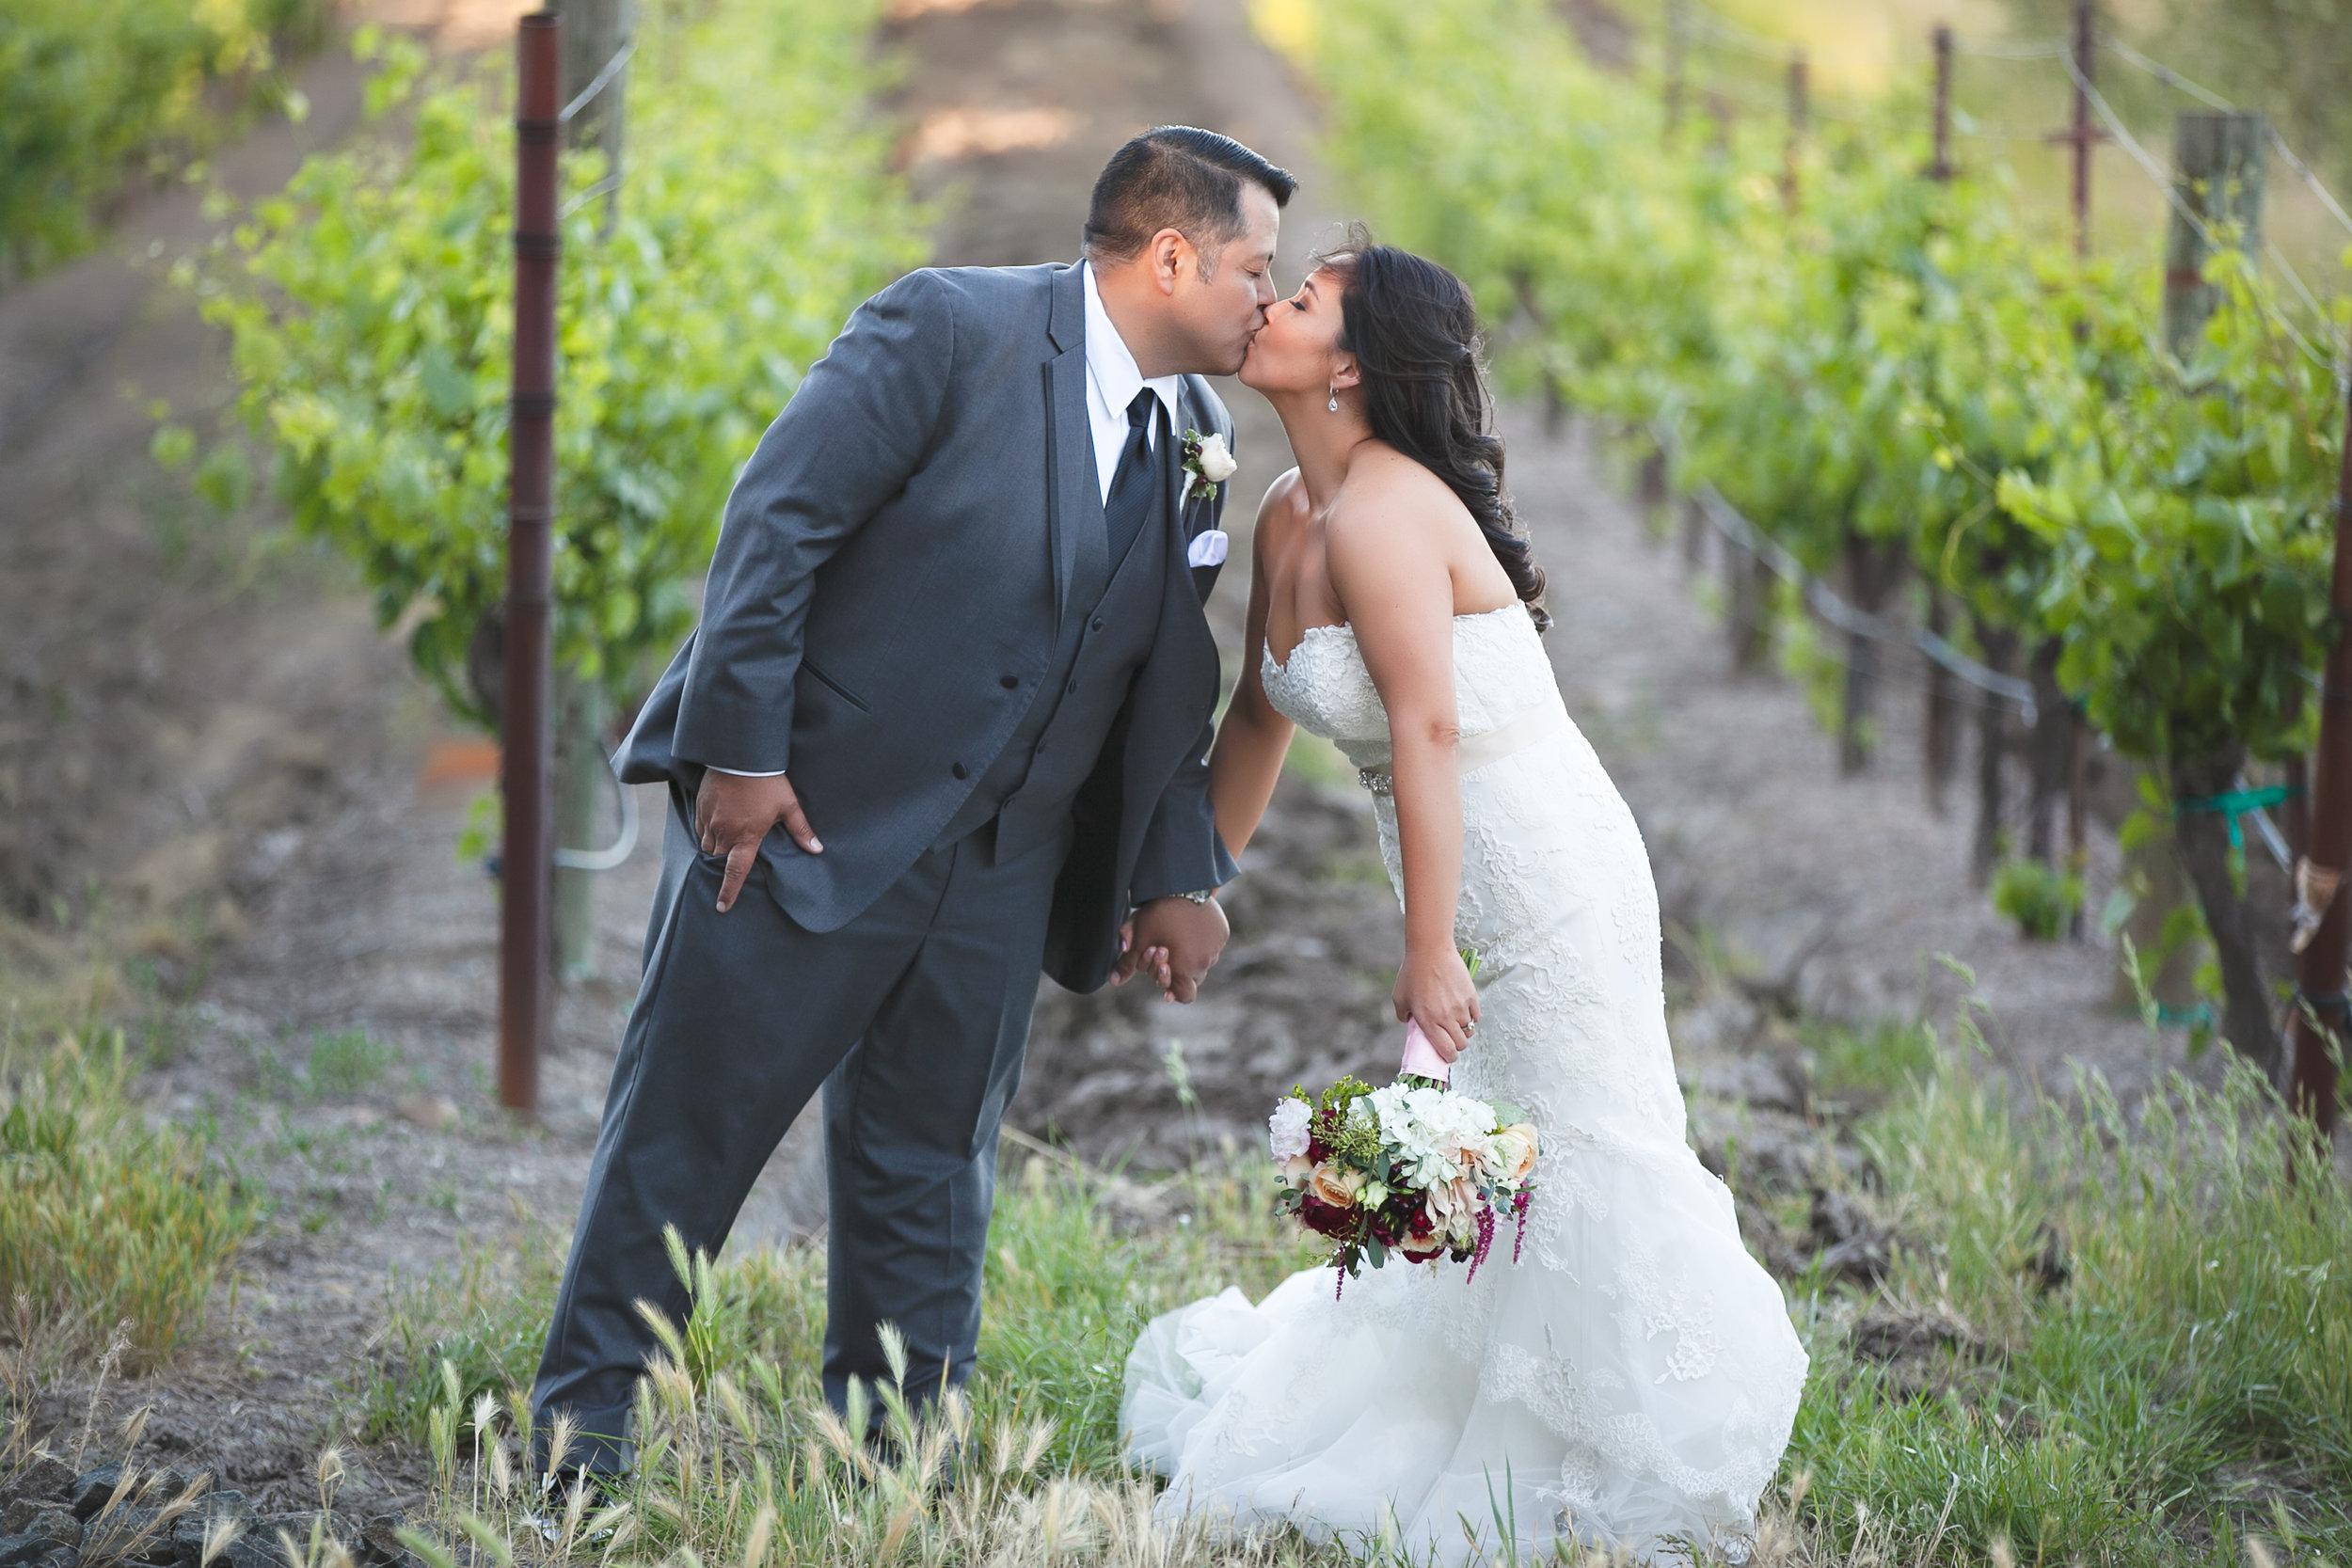 Karri + Ricardo | Gloria Ferrer Wine Caves | Sonoma, CA (as seen in Sonoma Magazine)